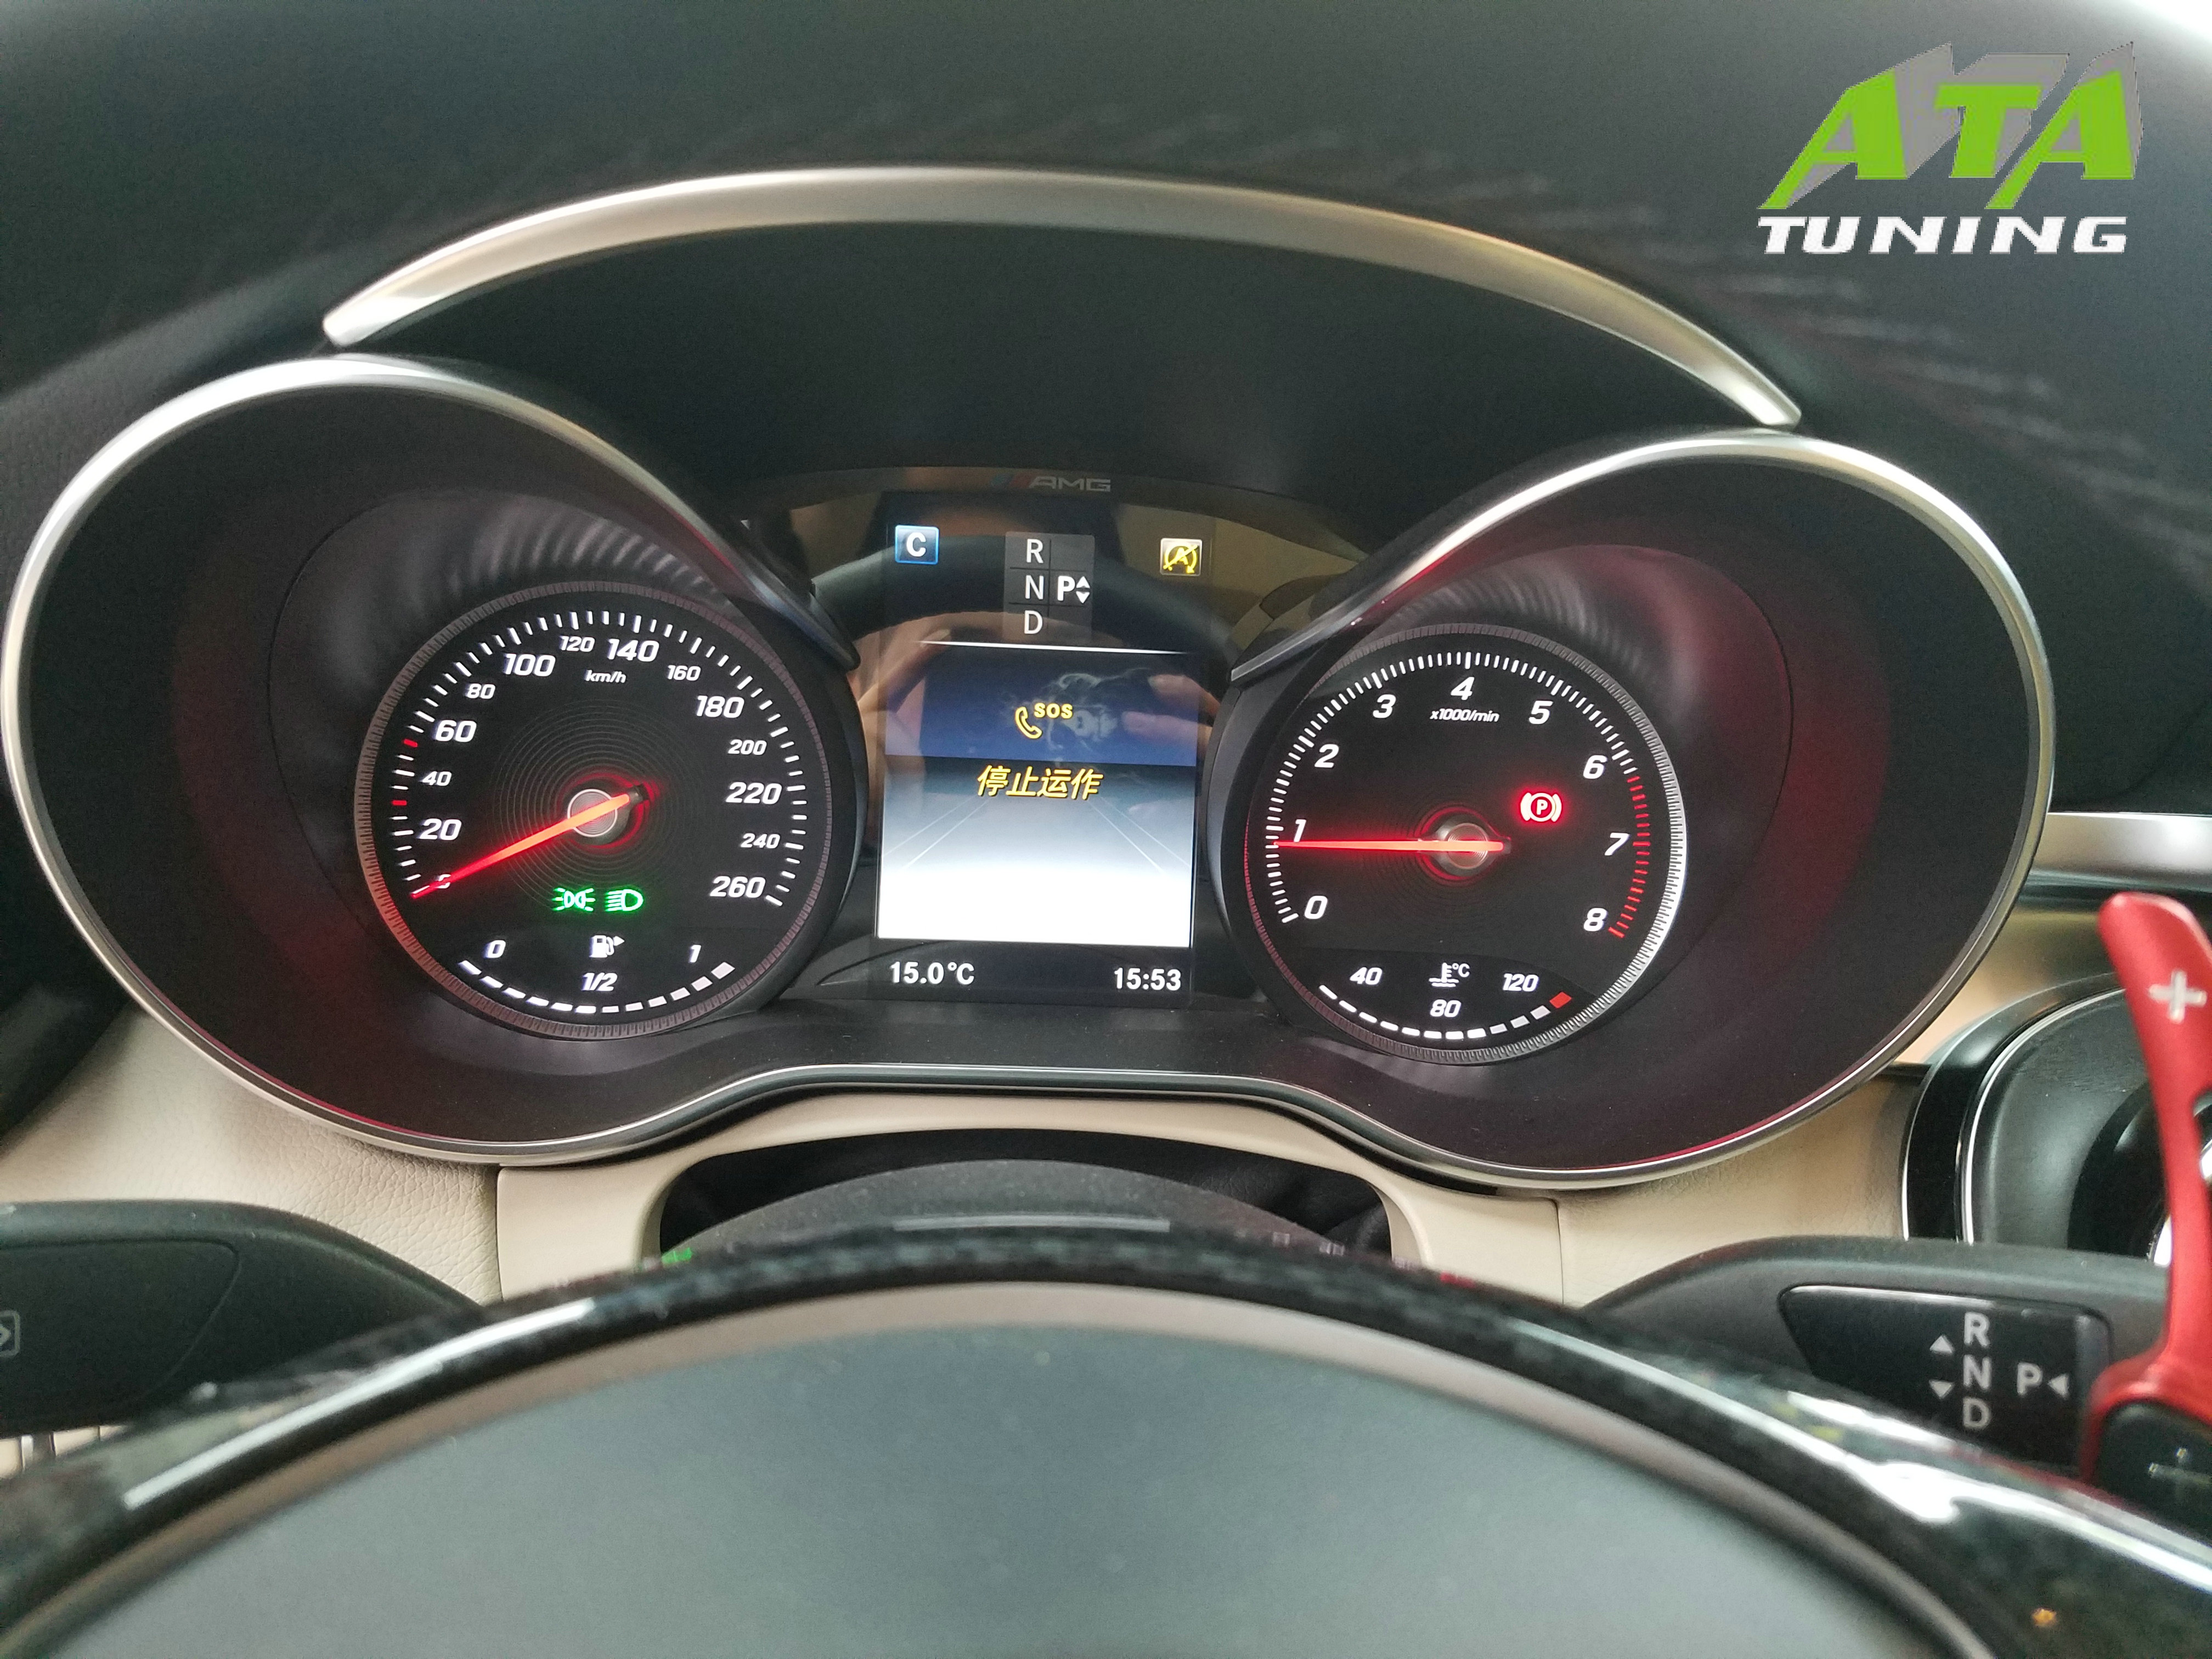 昆明奔驰C200L刷ECU,英国ATA-Tuning程序